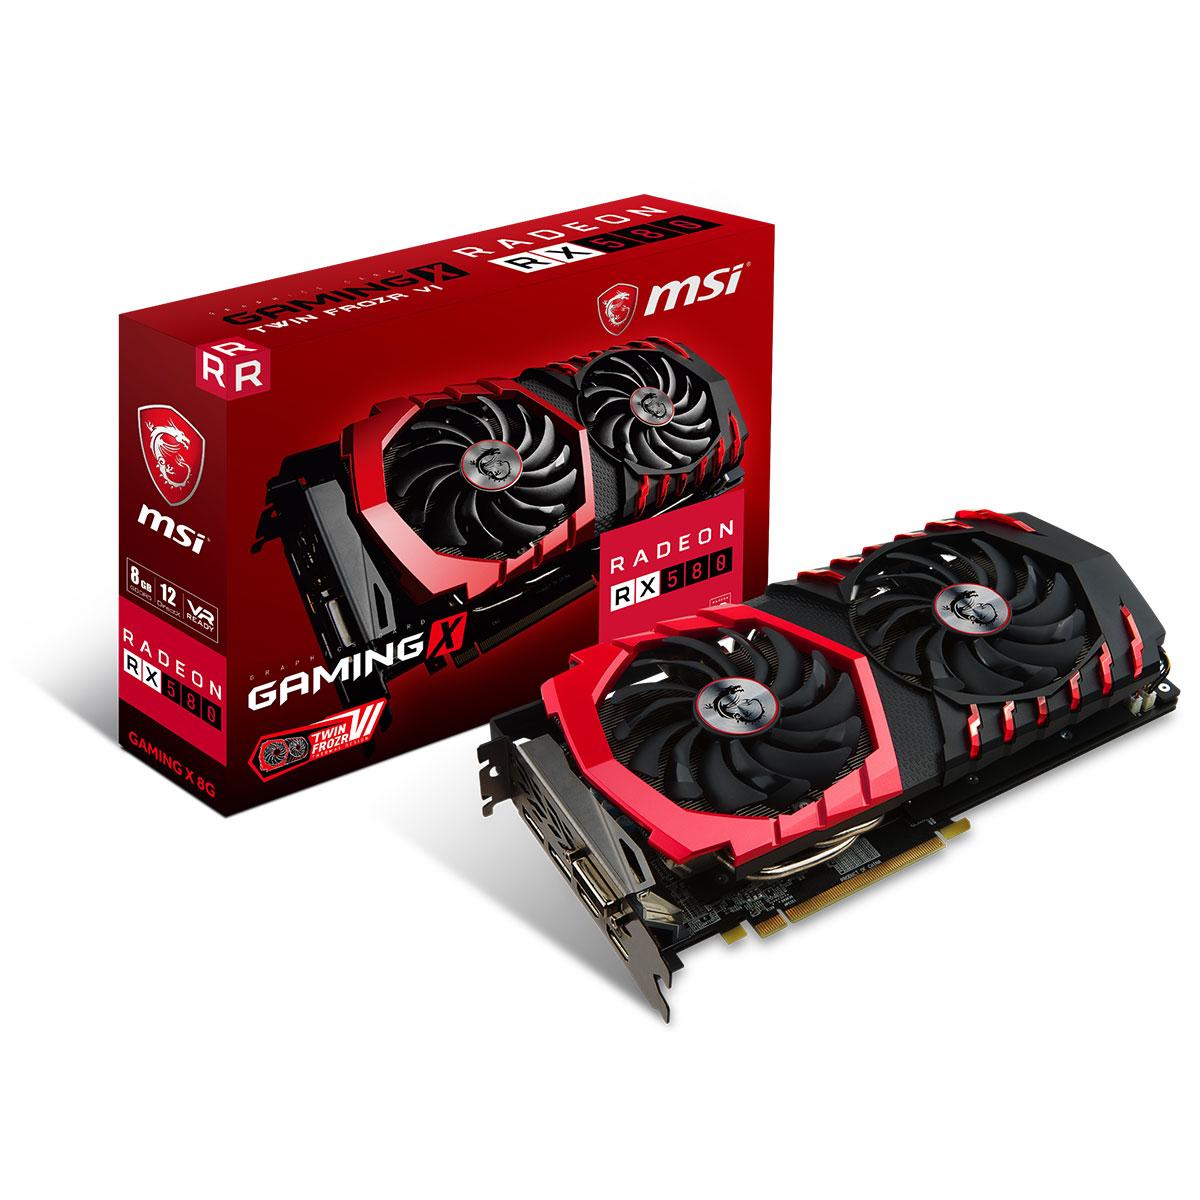 Carte graphique MSI Radeon RX 580 GAMING X 8G 8 Go DVI/Dual HDMI/Dual DisplayPort - PCI Express (AMD Radeon RX 580)